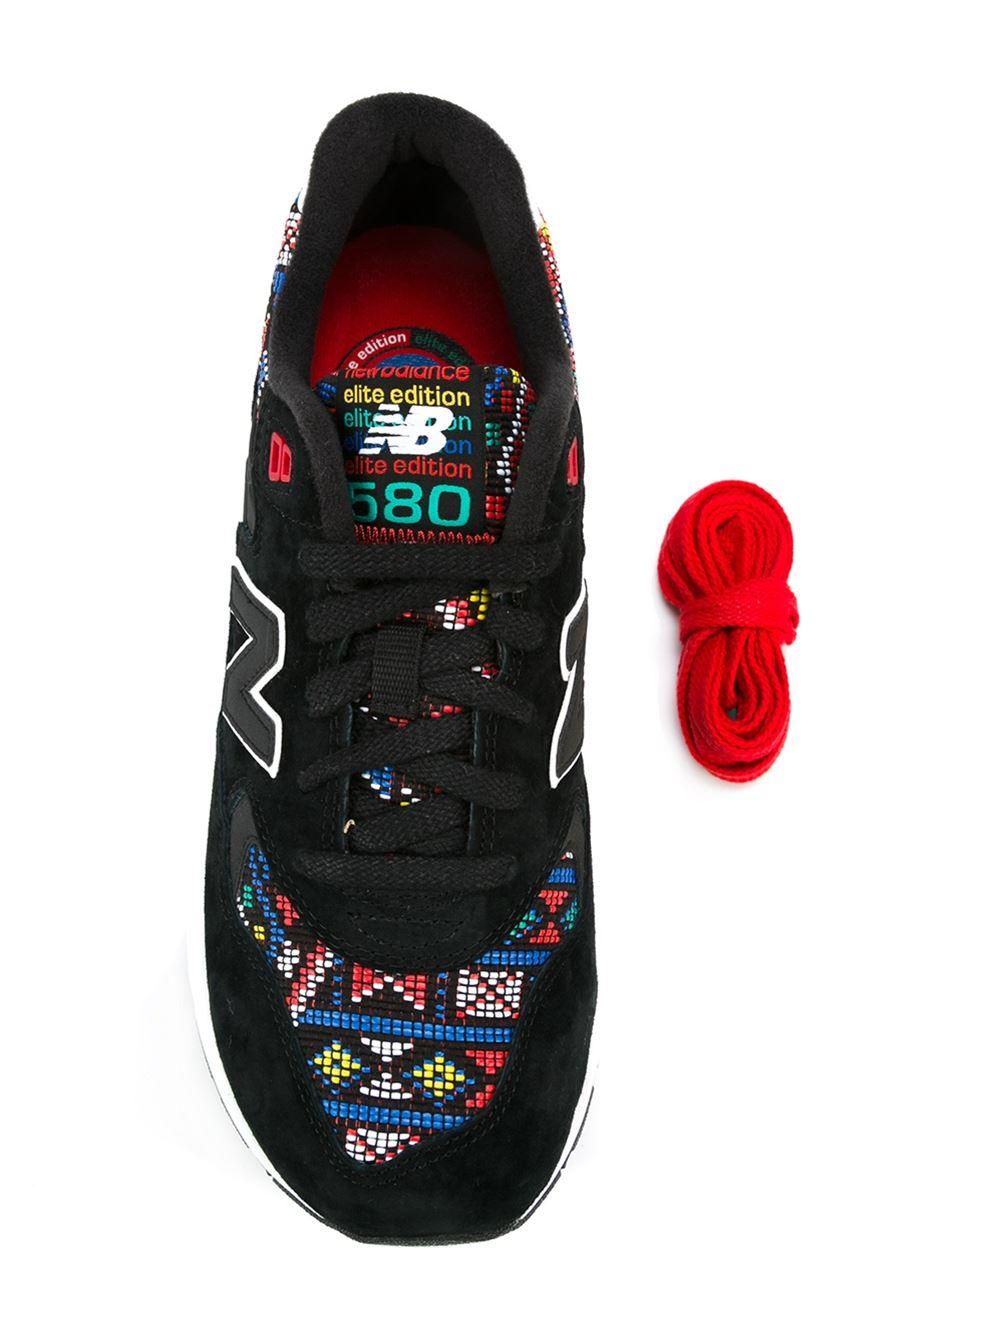 new balance 580 nere